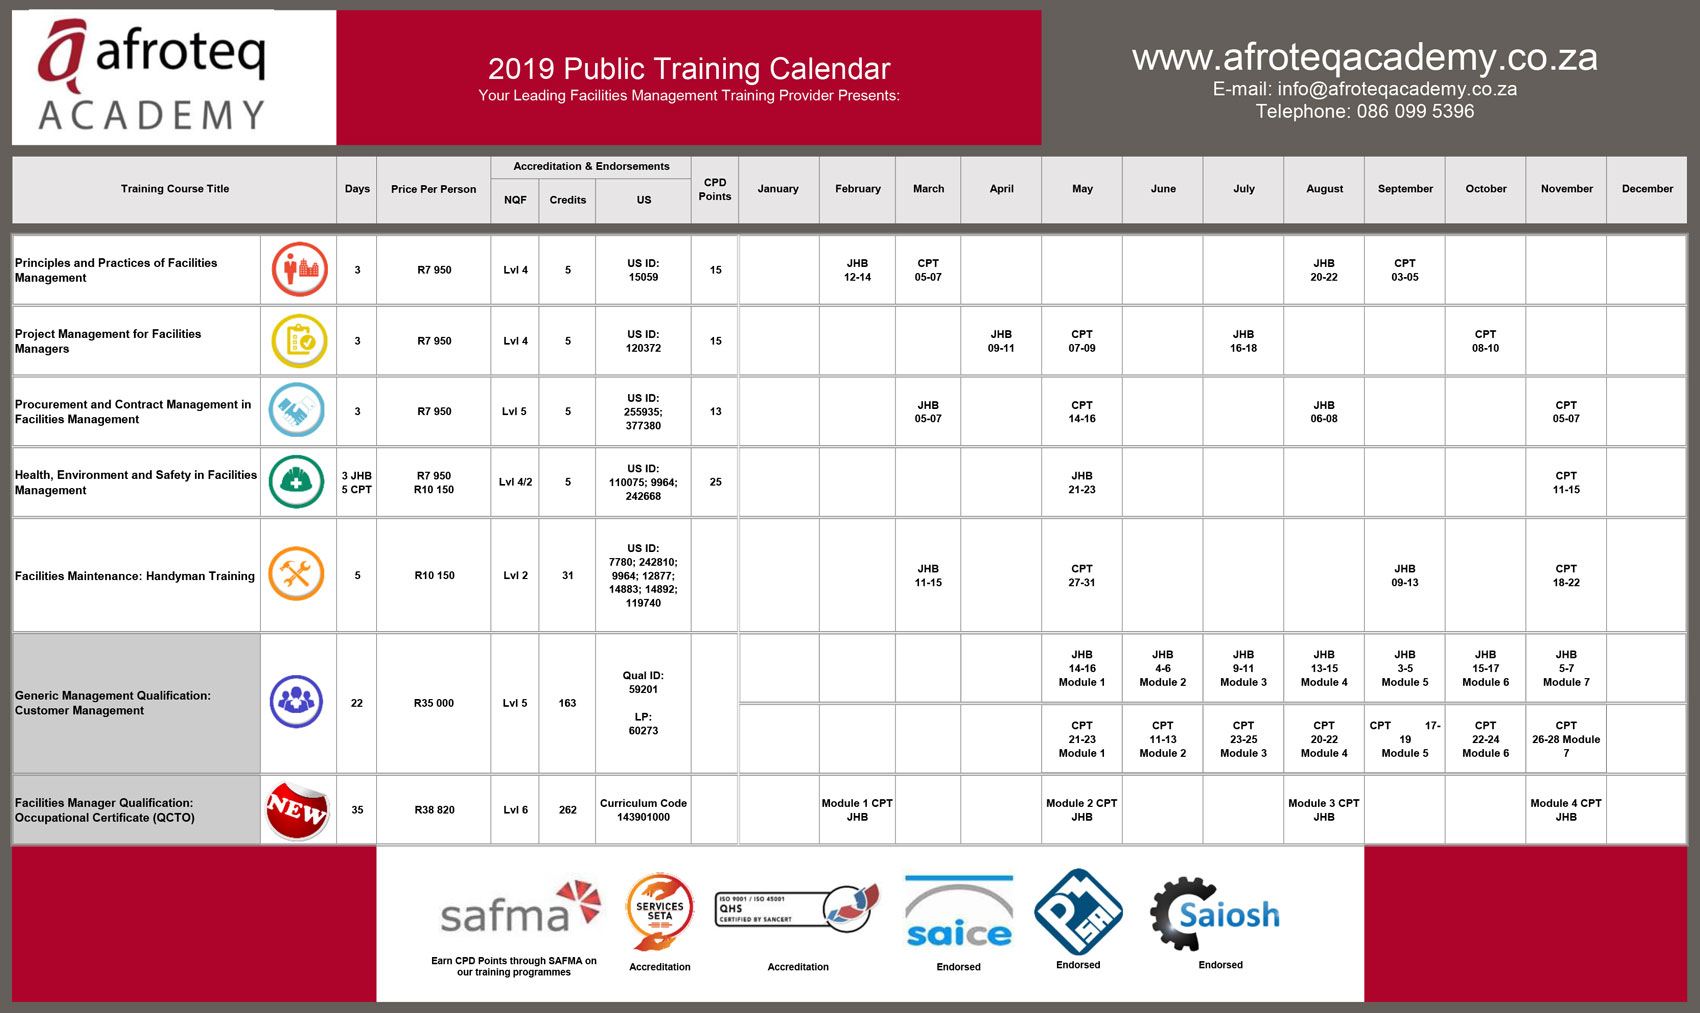 AFROTEQ Academy Training Calendar 2019